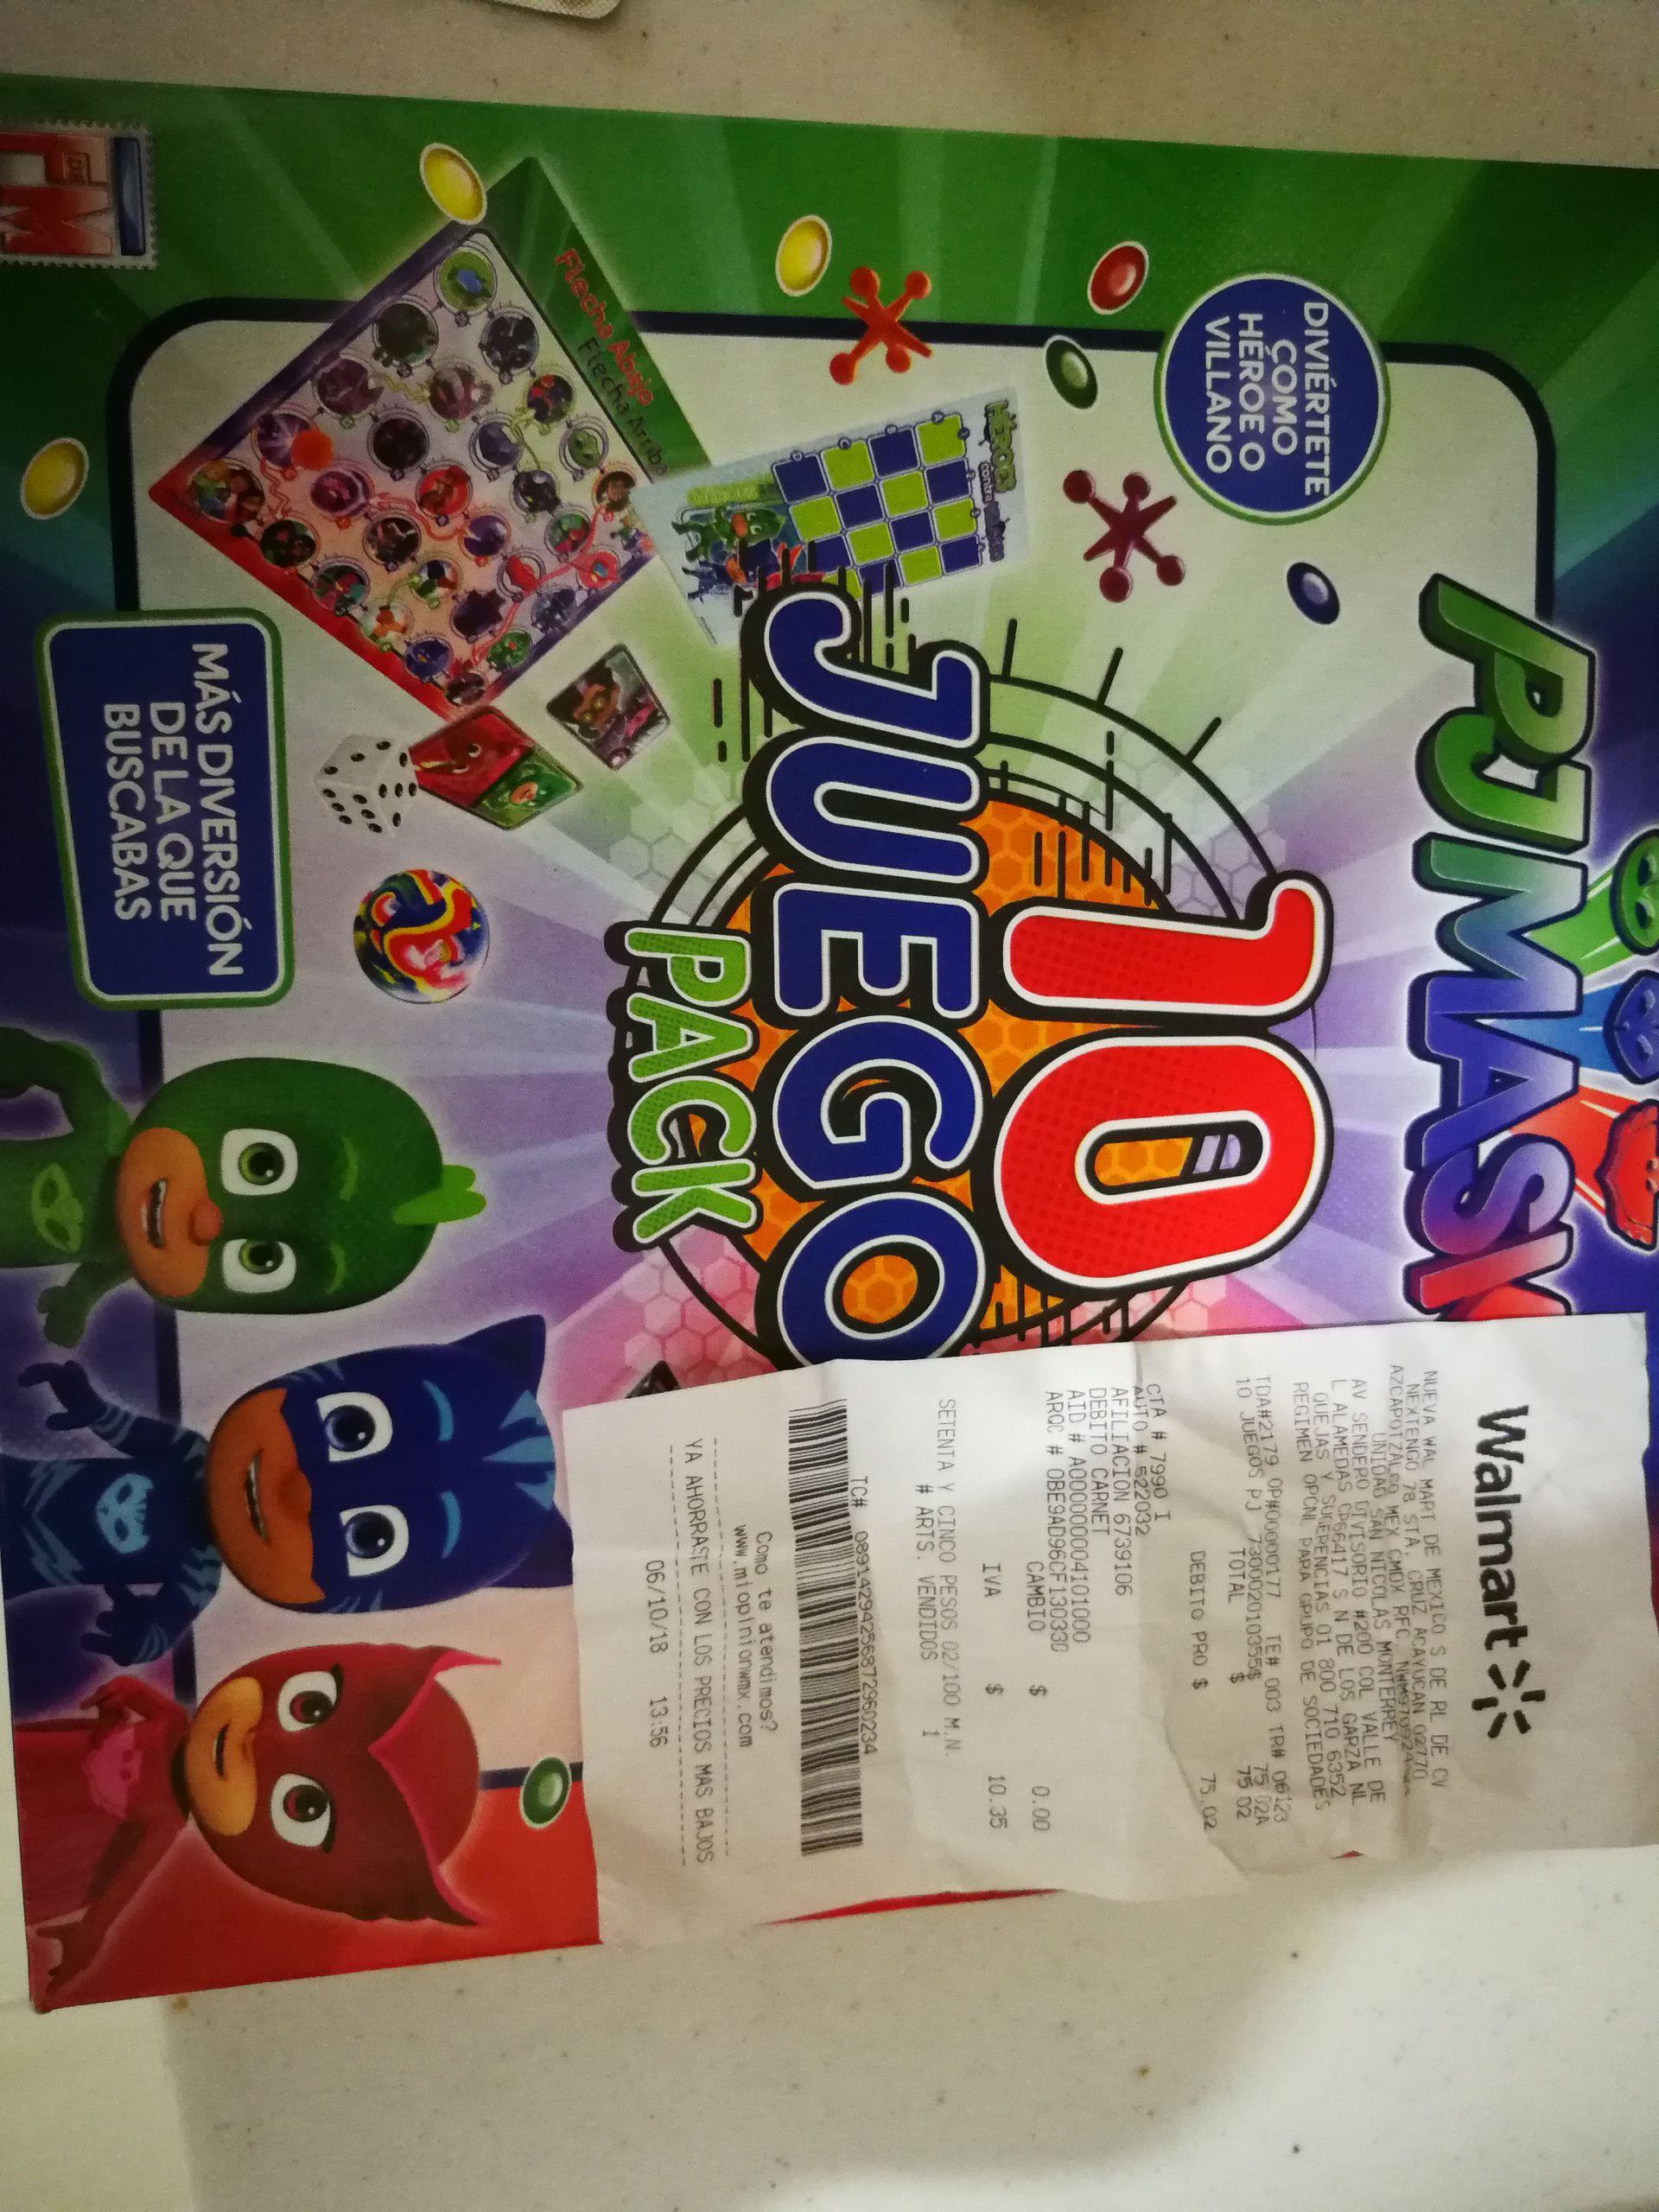 Walmart Sendero Pack 10 Juegos De Mesa Pjmask Promodescuentos Com